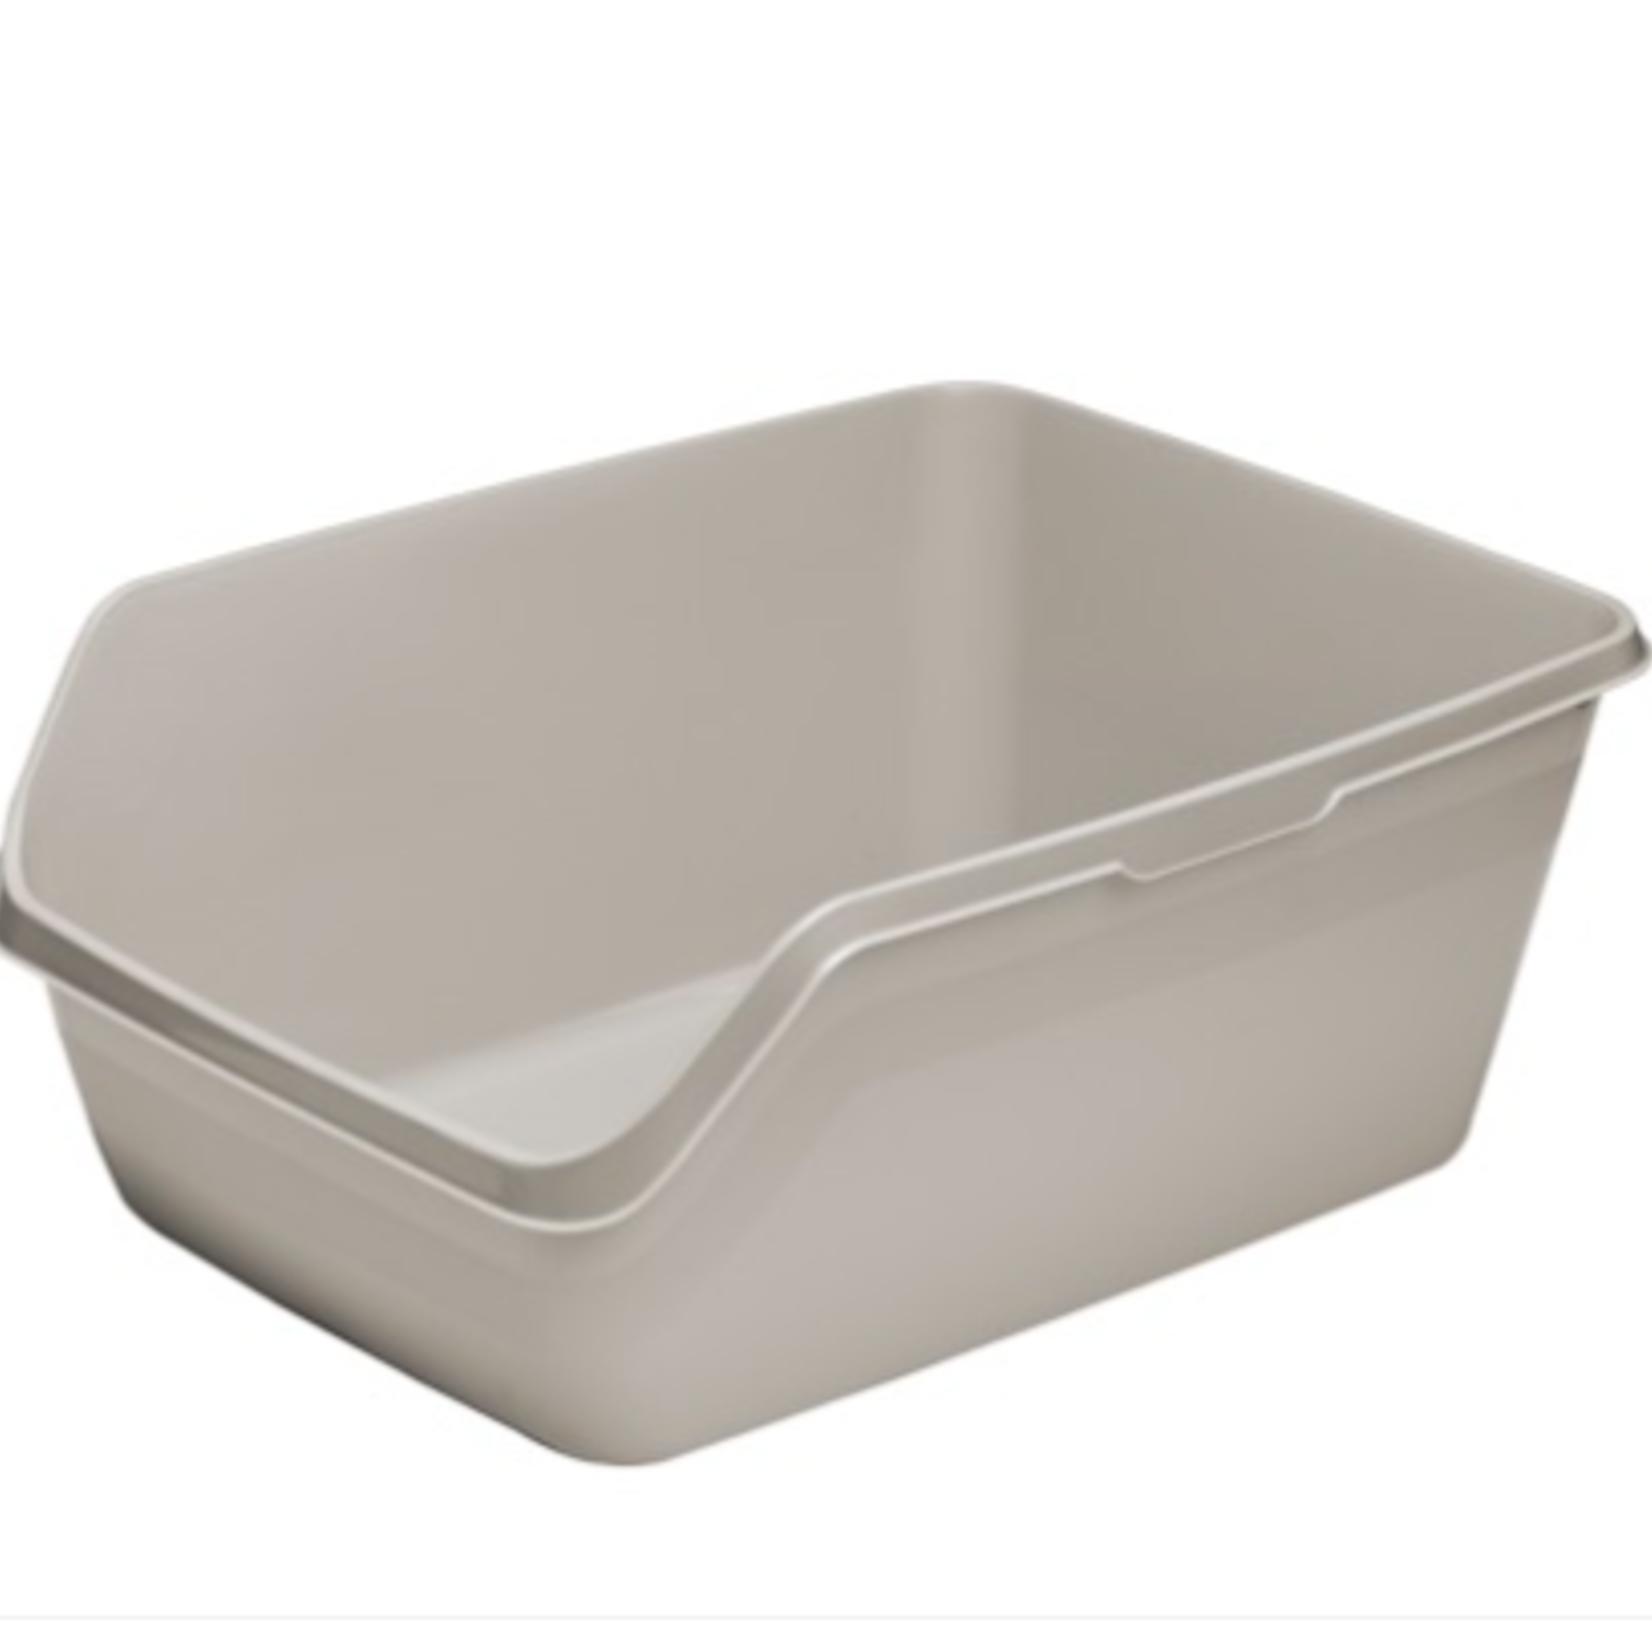 Moderna Litter box-Square Highback Tray-Large-Warm Grey